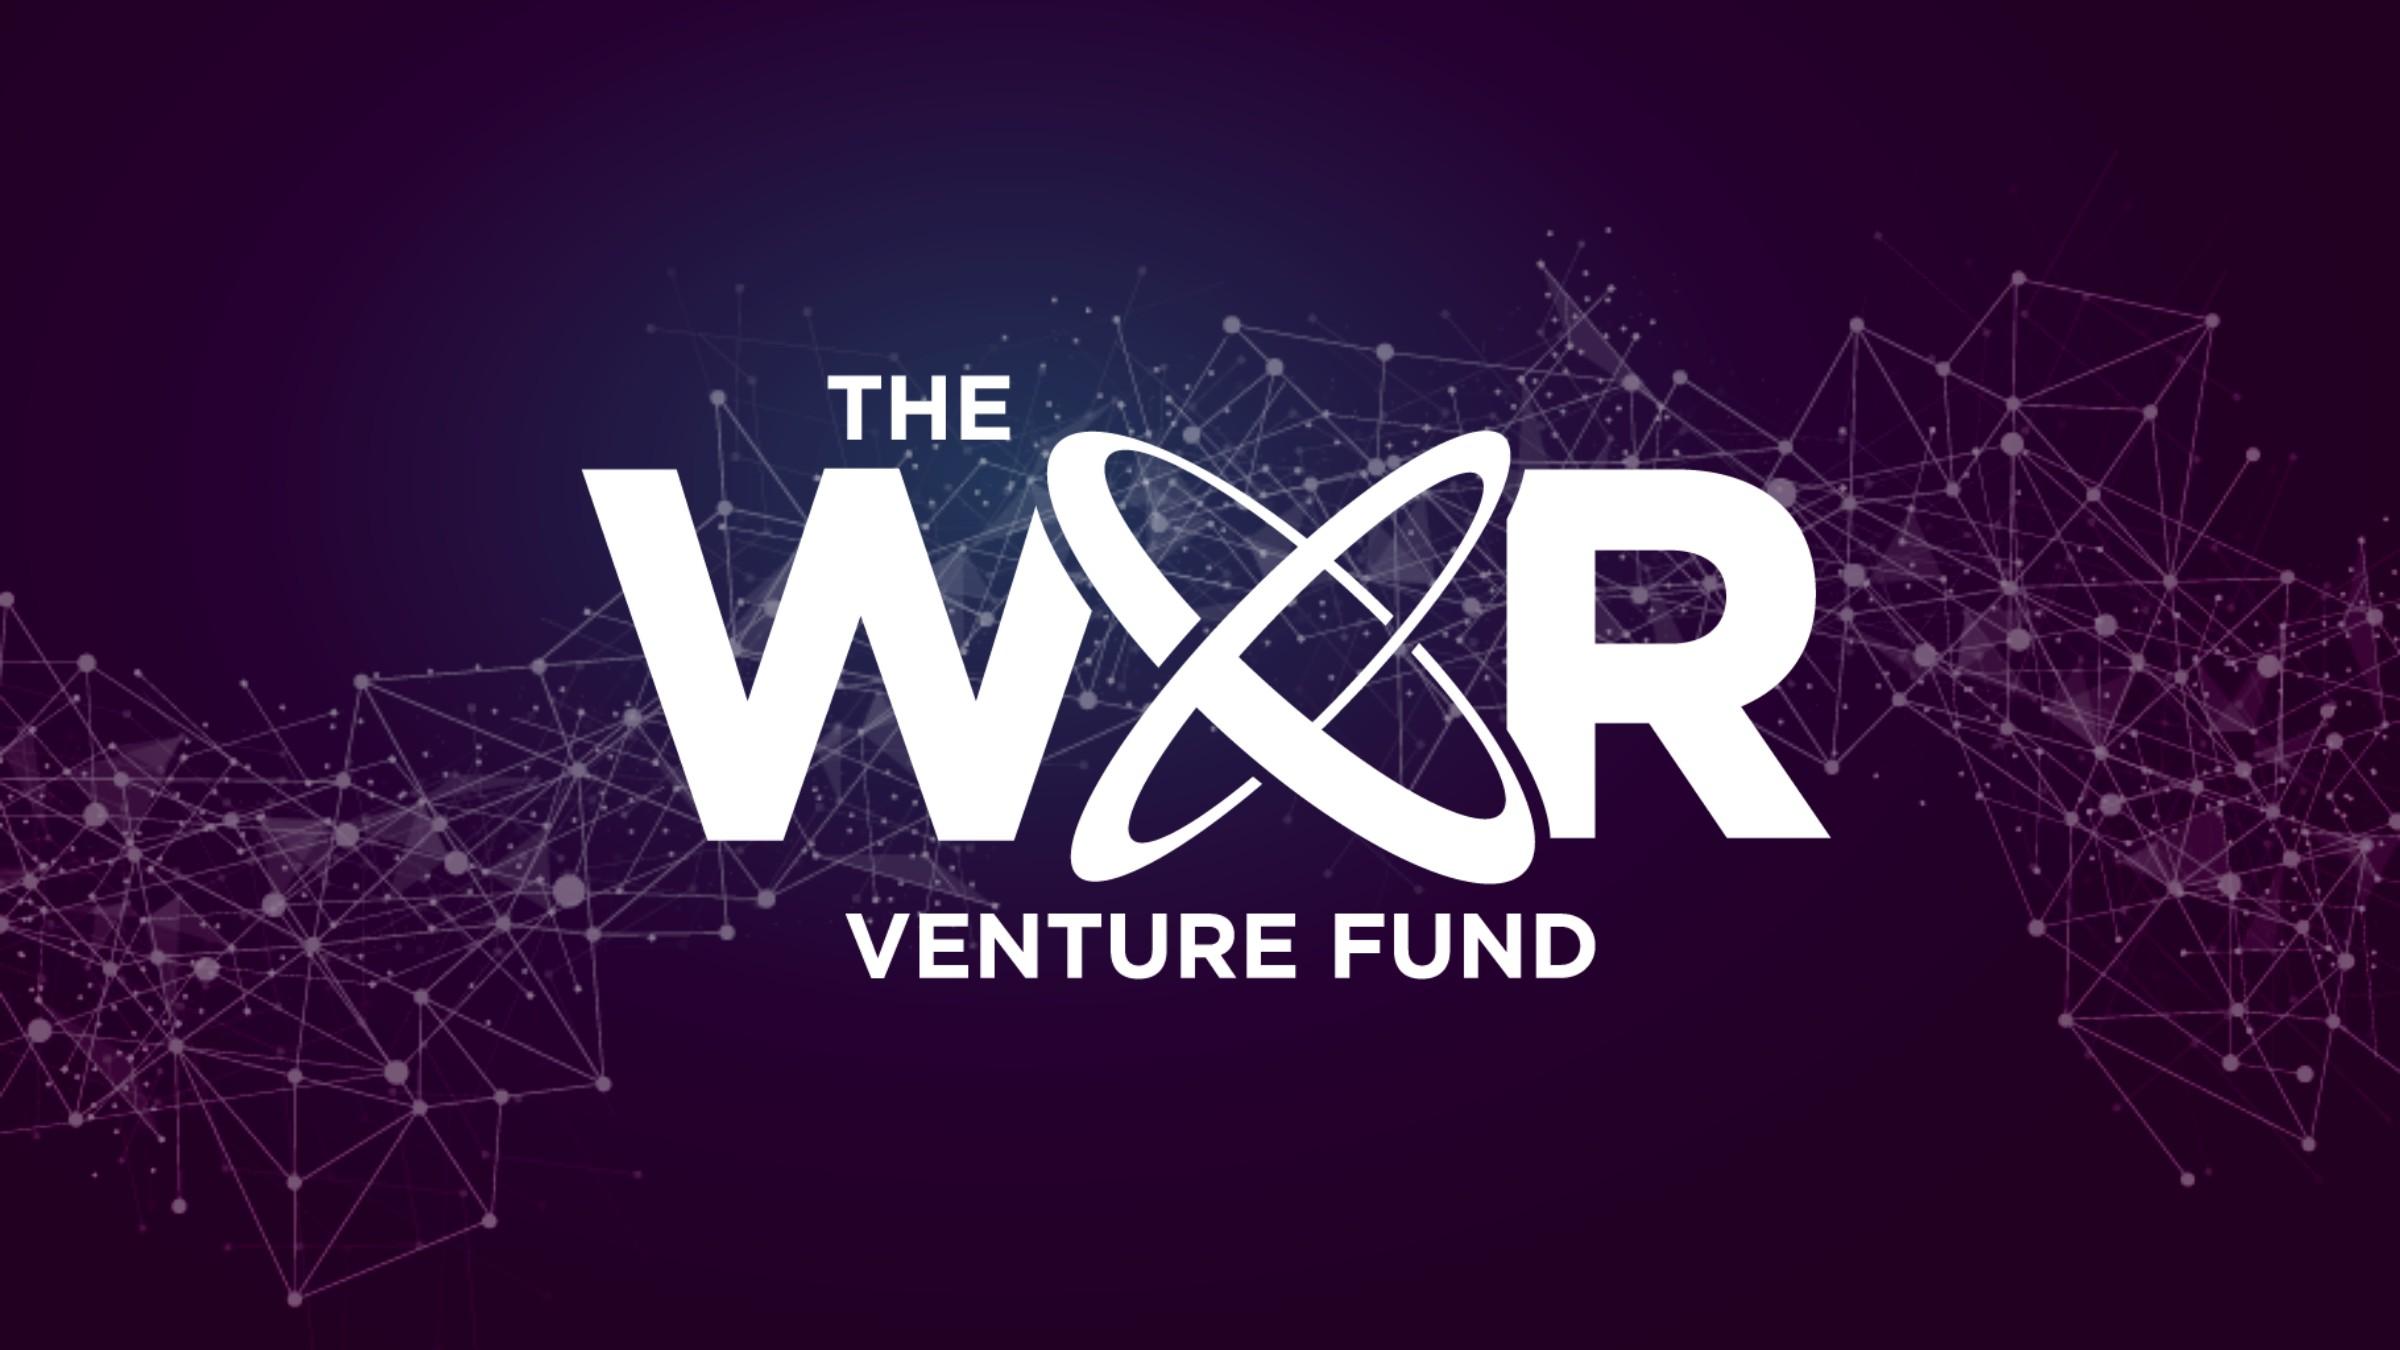 WXR-Venture-Fund-VRAR-Global-Summit-VRARAGS-VRAR-Association.jpg